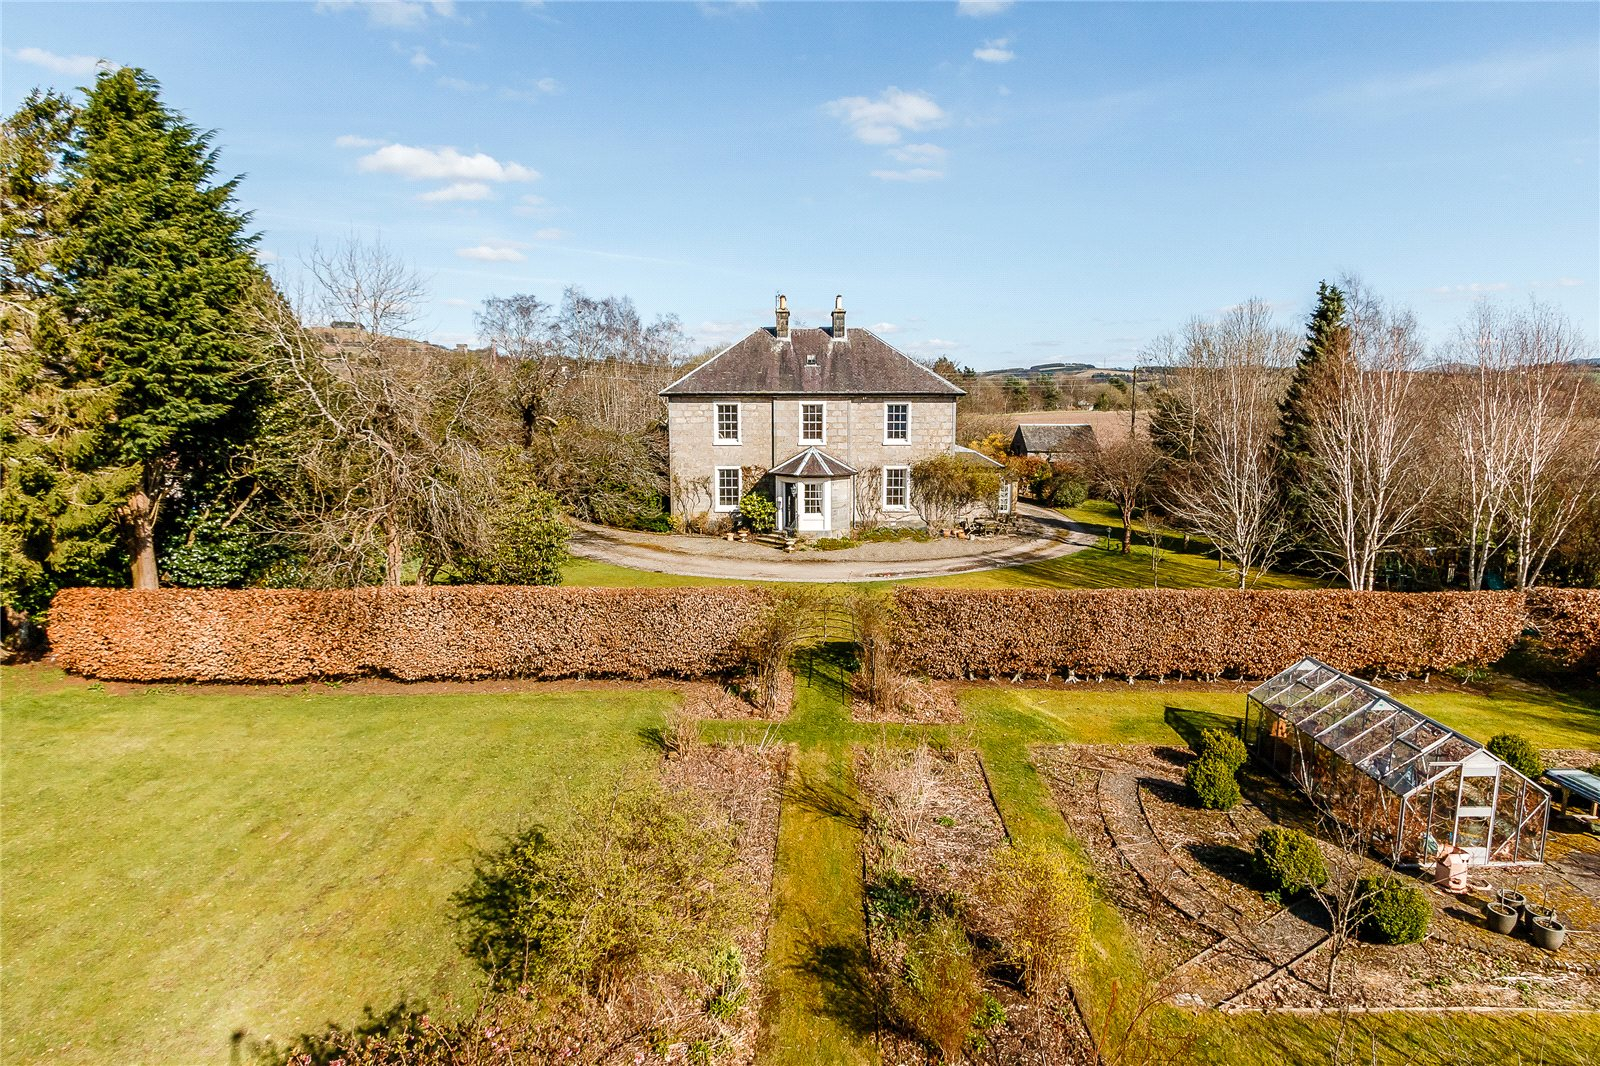 Single Family Home for Sale at Devon Road, Dollar, Clackmannanshire, FK14 Clackmannanshire, Scotland